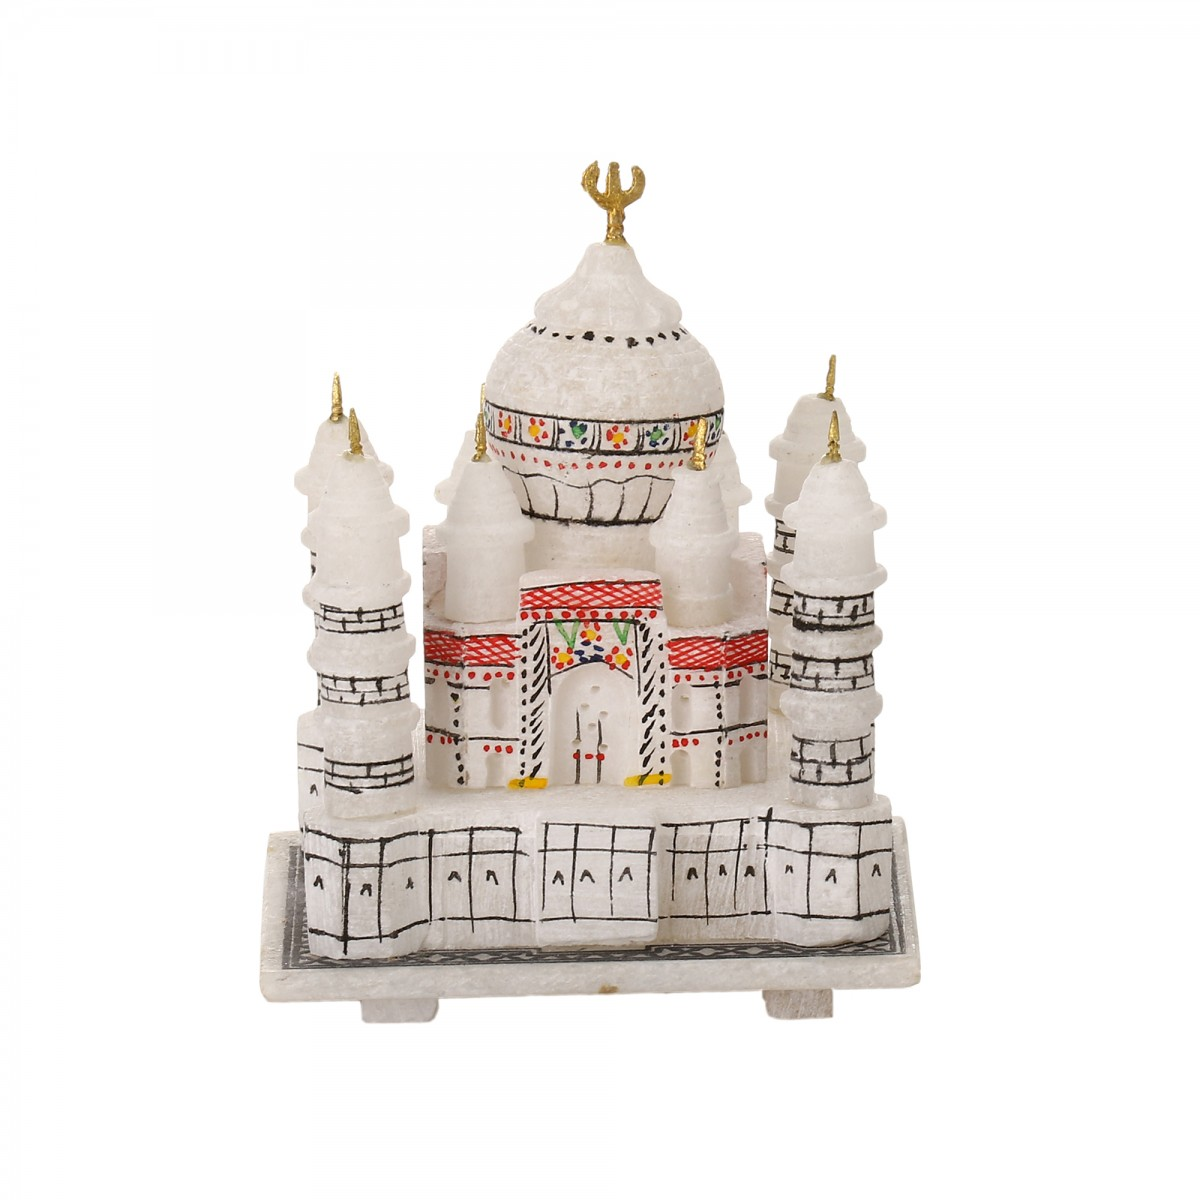 White Marble Taj Mahal Replica | Marble-inlay-art